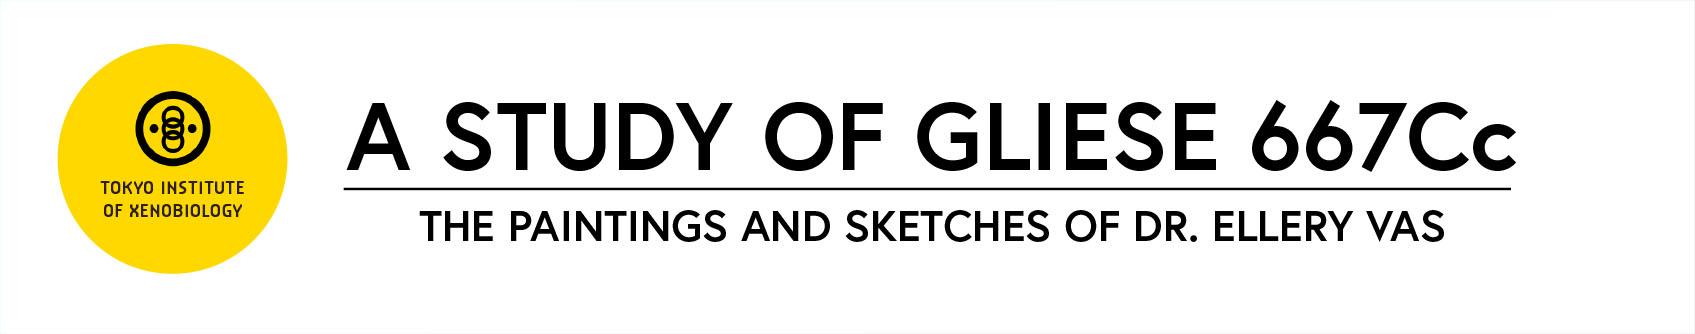 A Study of Gliese 667Cc